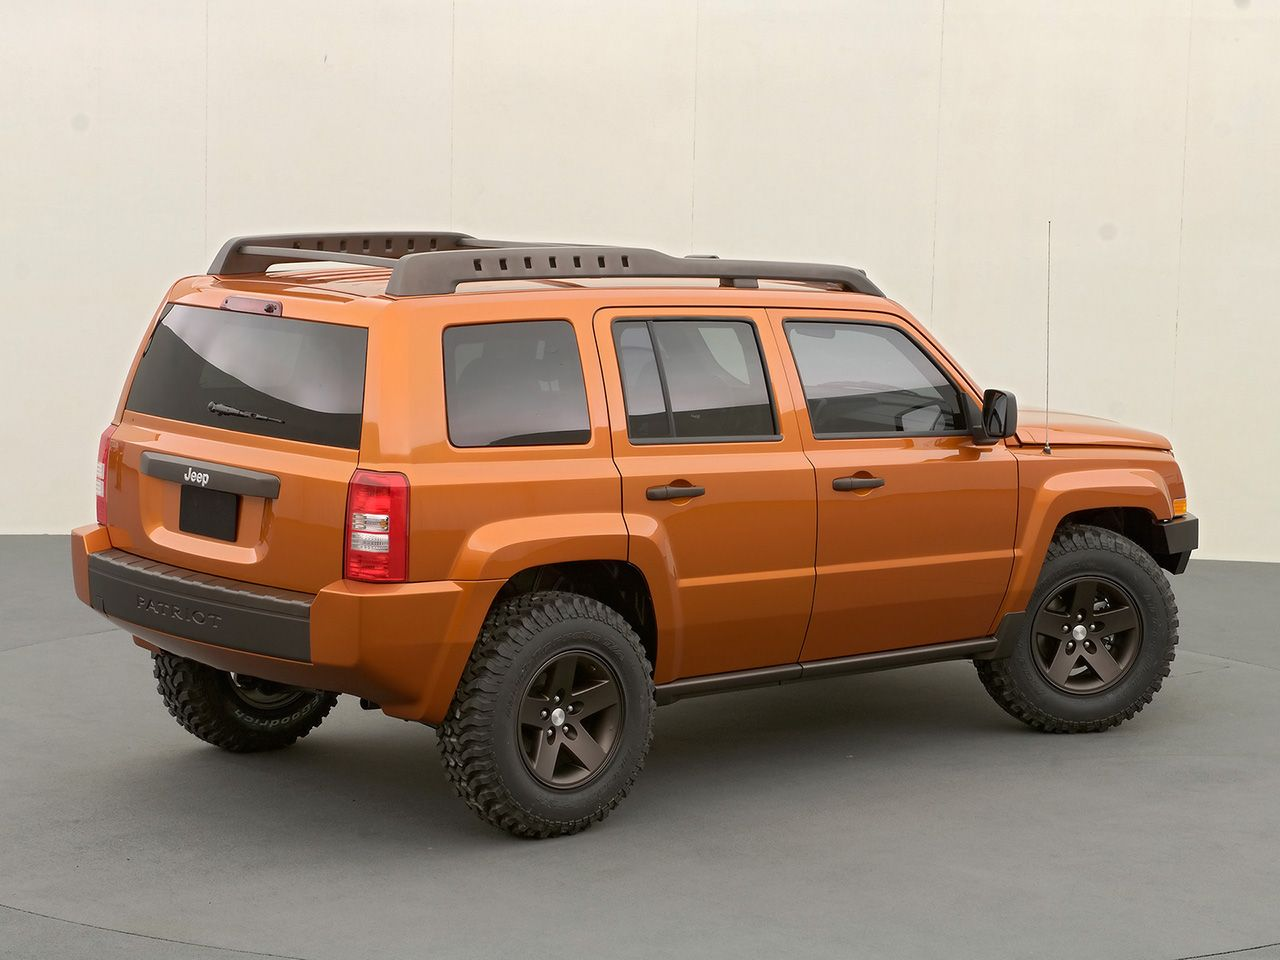 2006 jeep patriot 2006 jeep patriot sema concept rear and side 1280x960